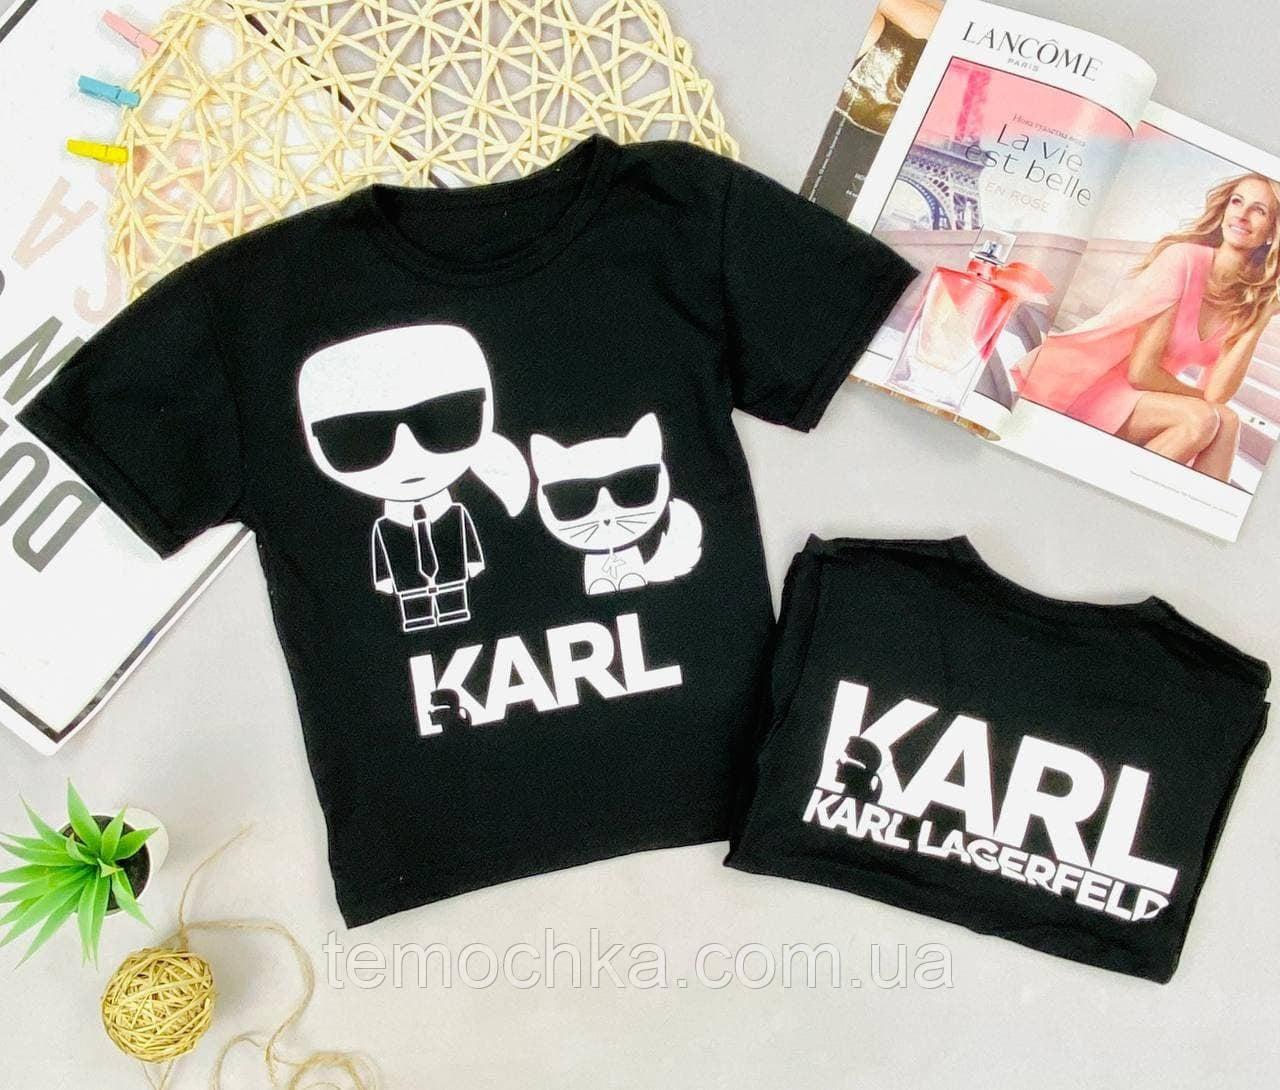 Стильна дитяча футболка чорна Карл Лагерфельд